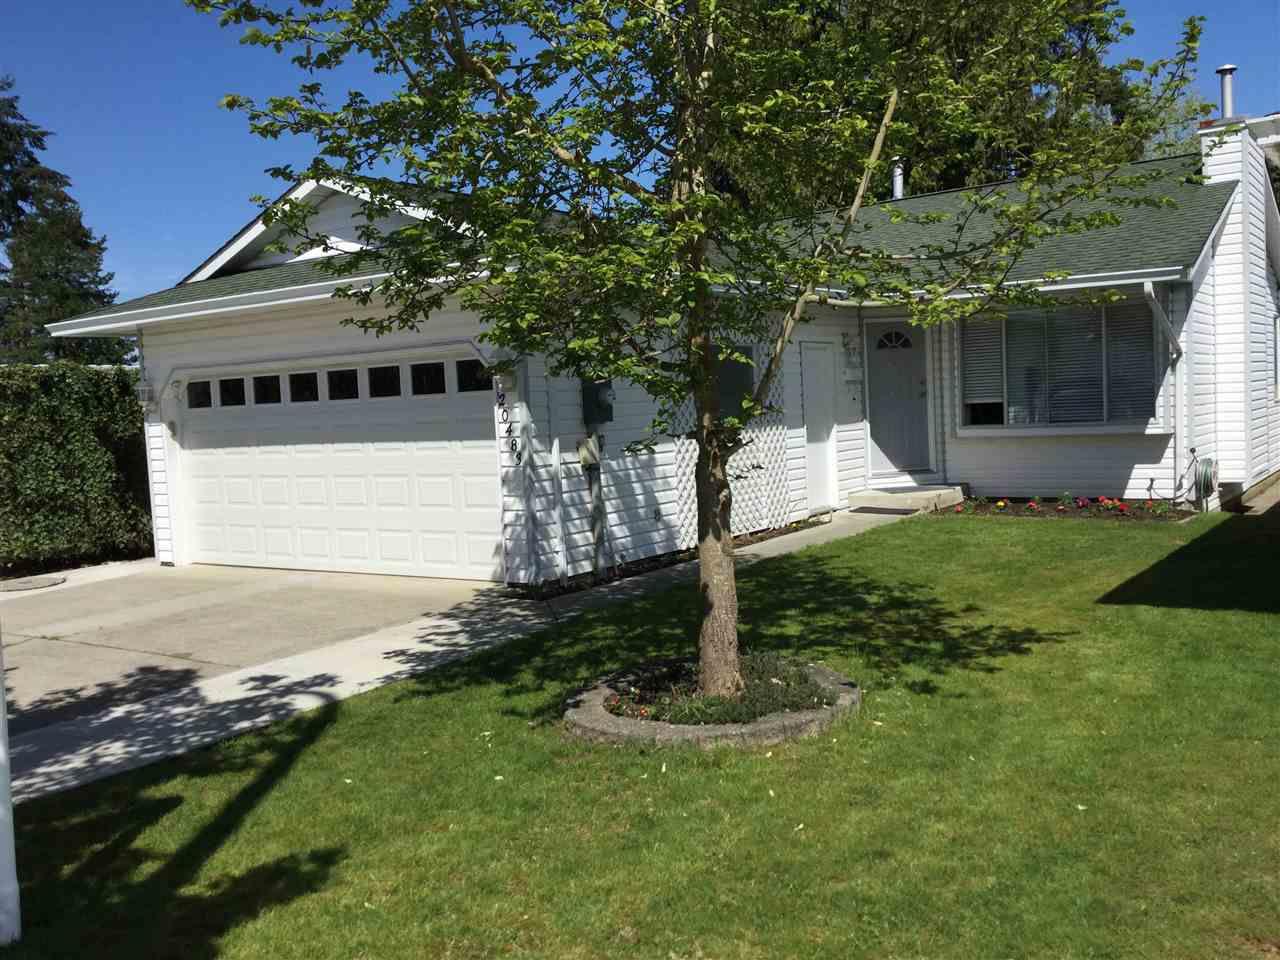 Main Photo: 20483 118TH Avenue in Maple Ridge: Southwest Maple Ridge House for sale : MLS®# R2166044